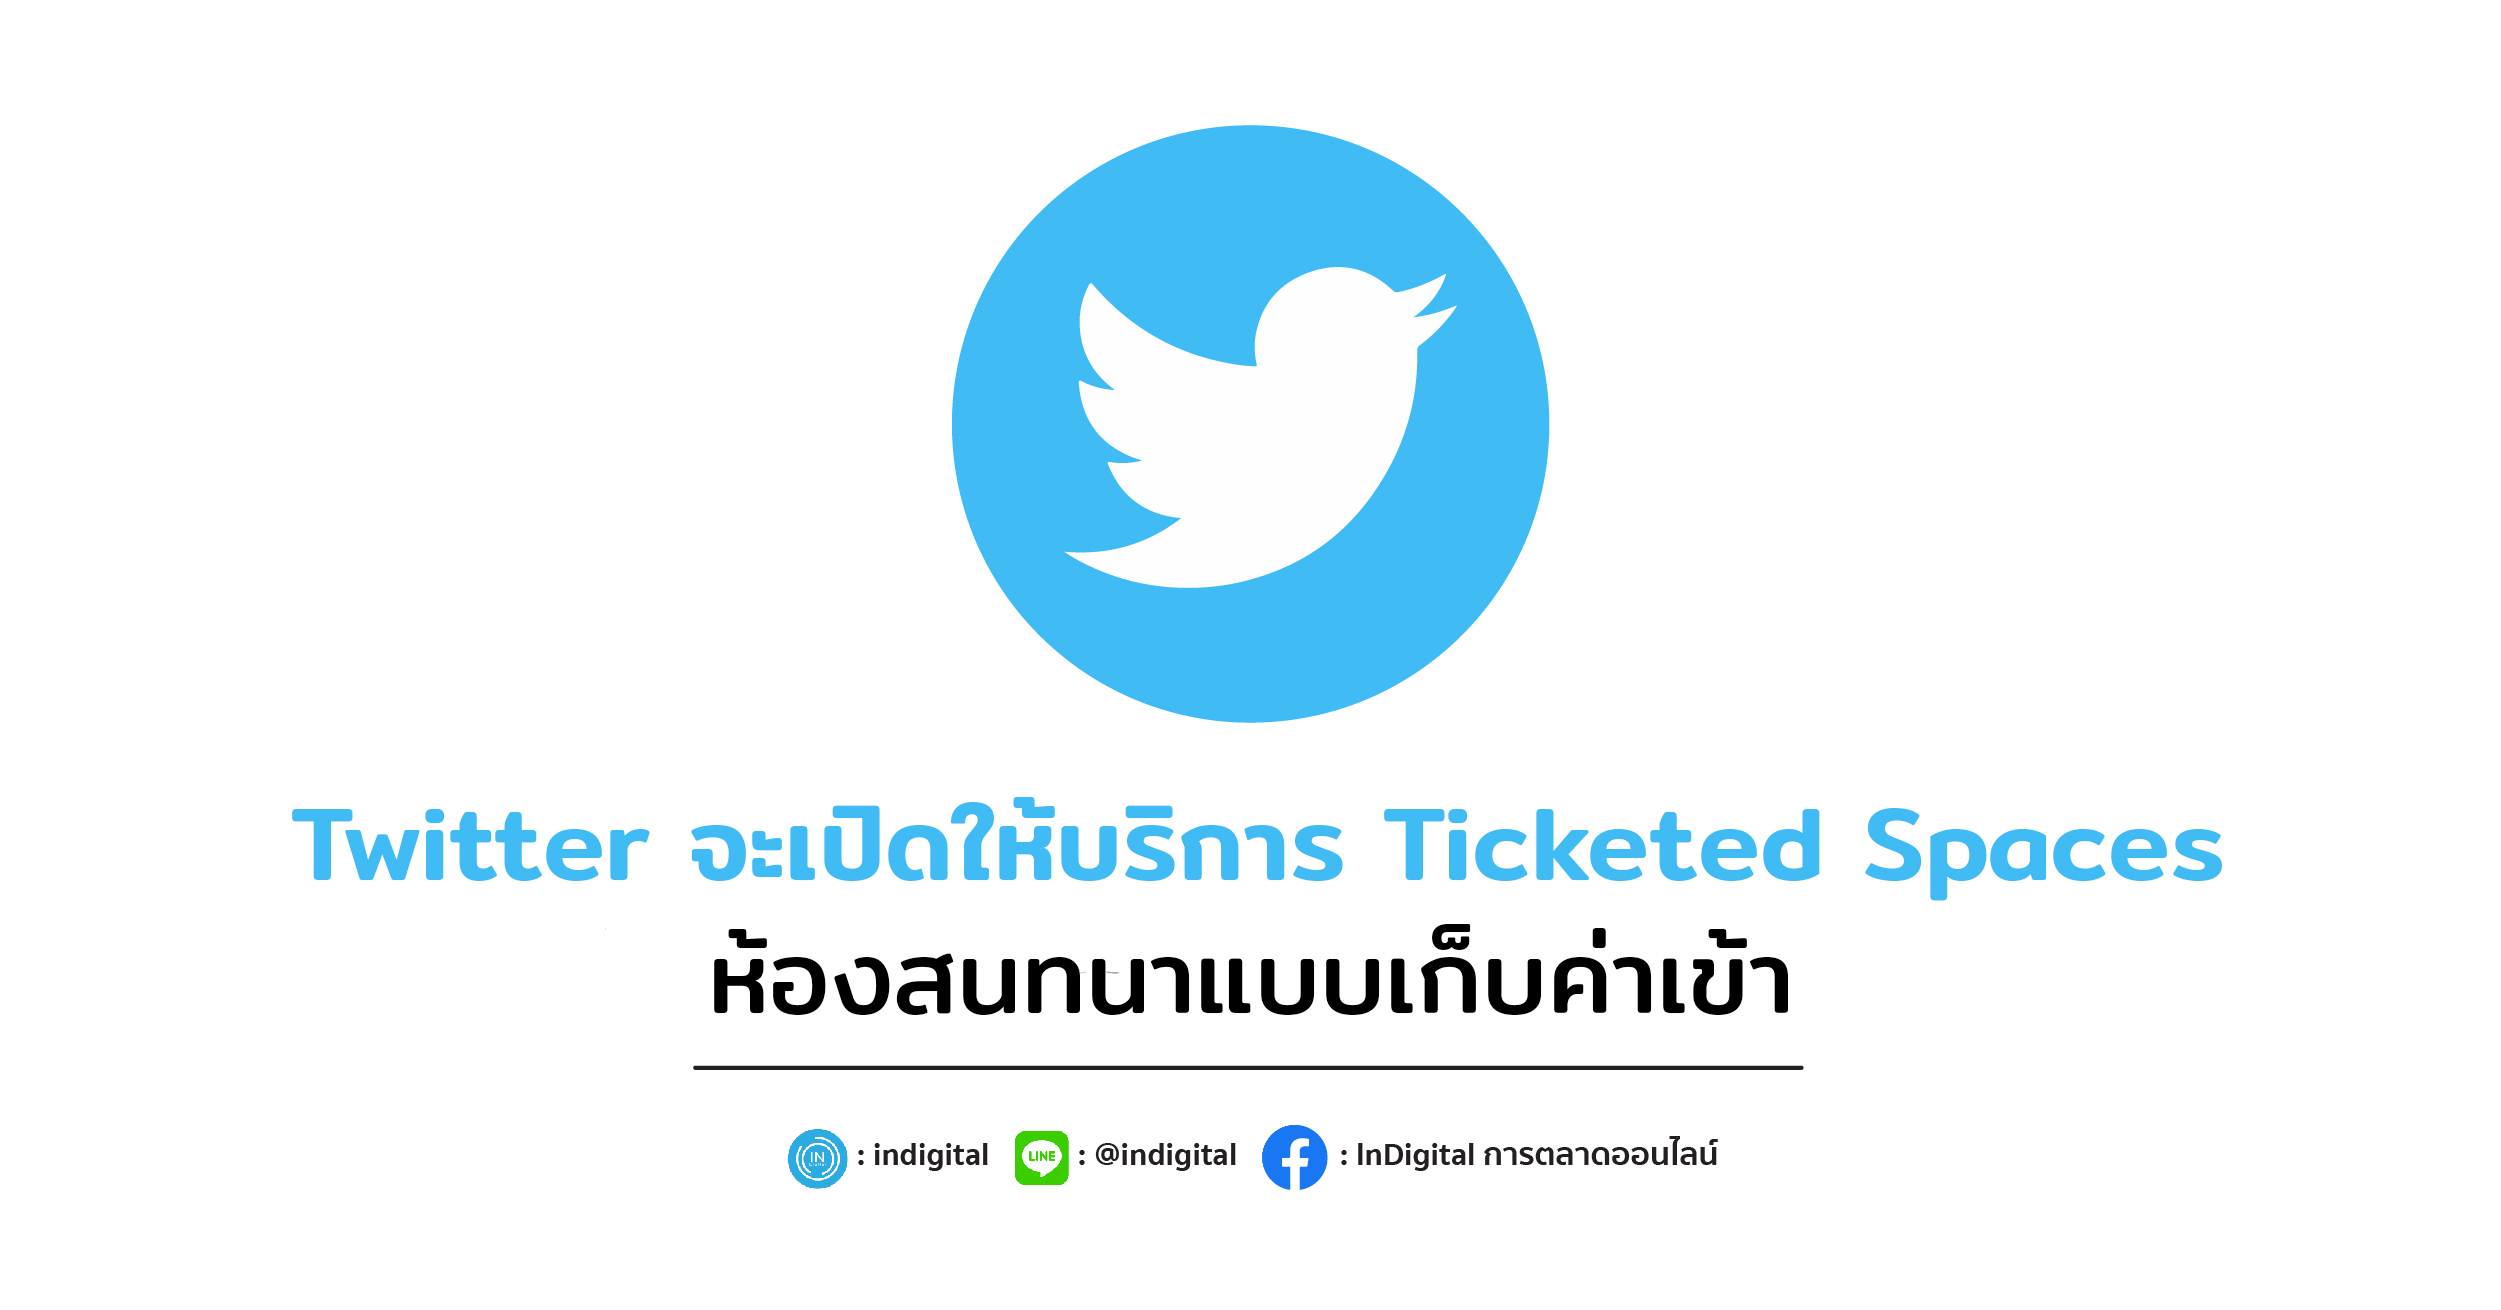 Twitter จะเปิดให้บริการ Ticketed Spaces ห้องสนทนาแบบเก็บค่าเข้า